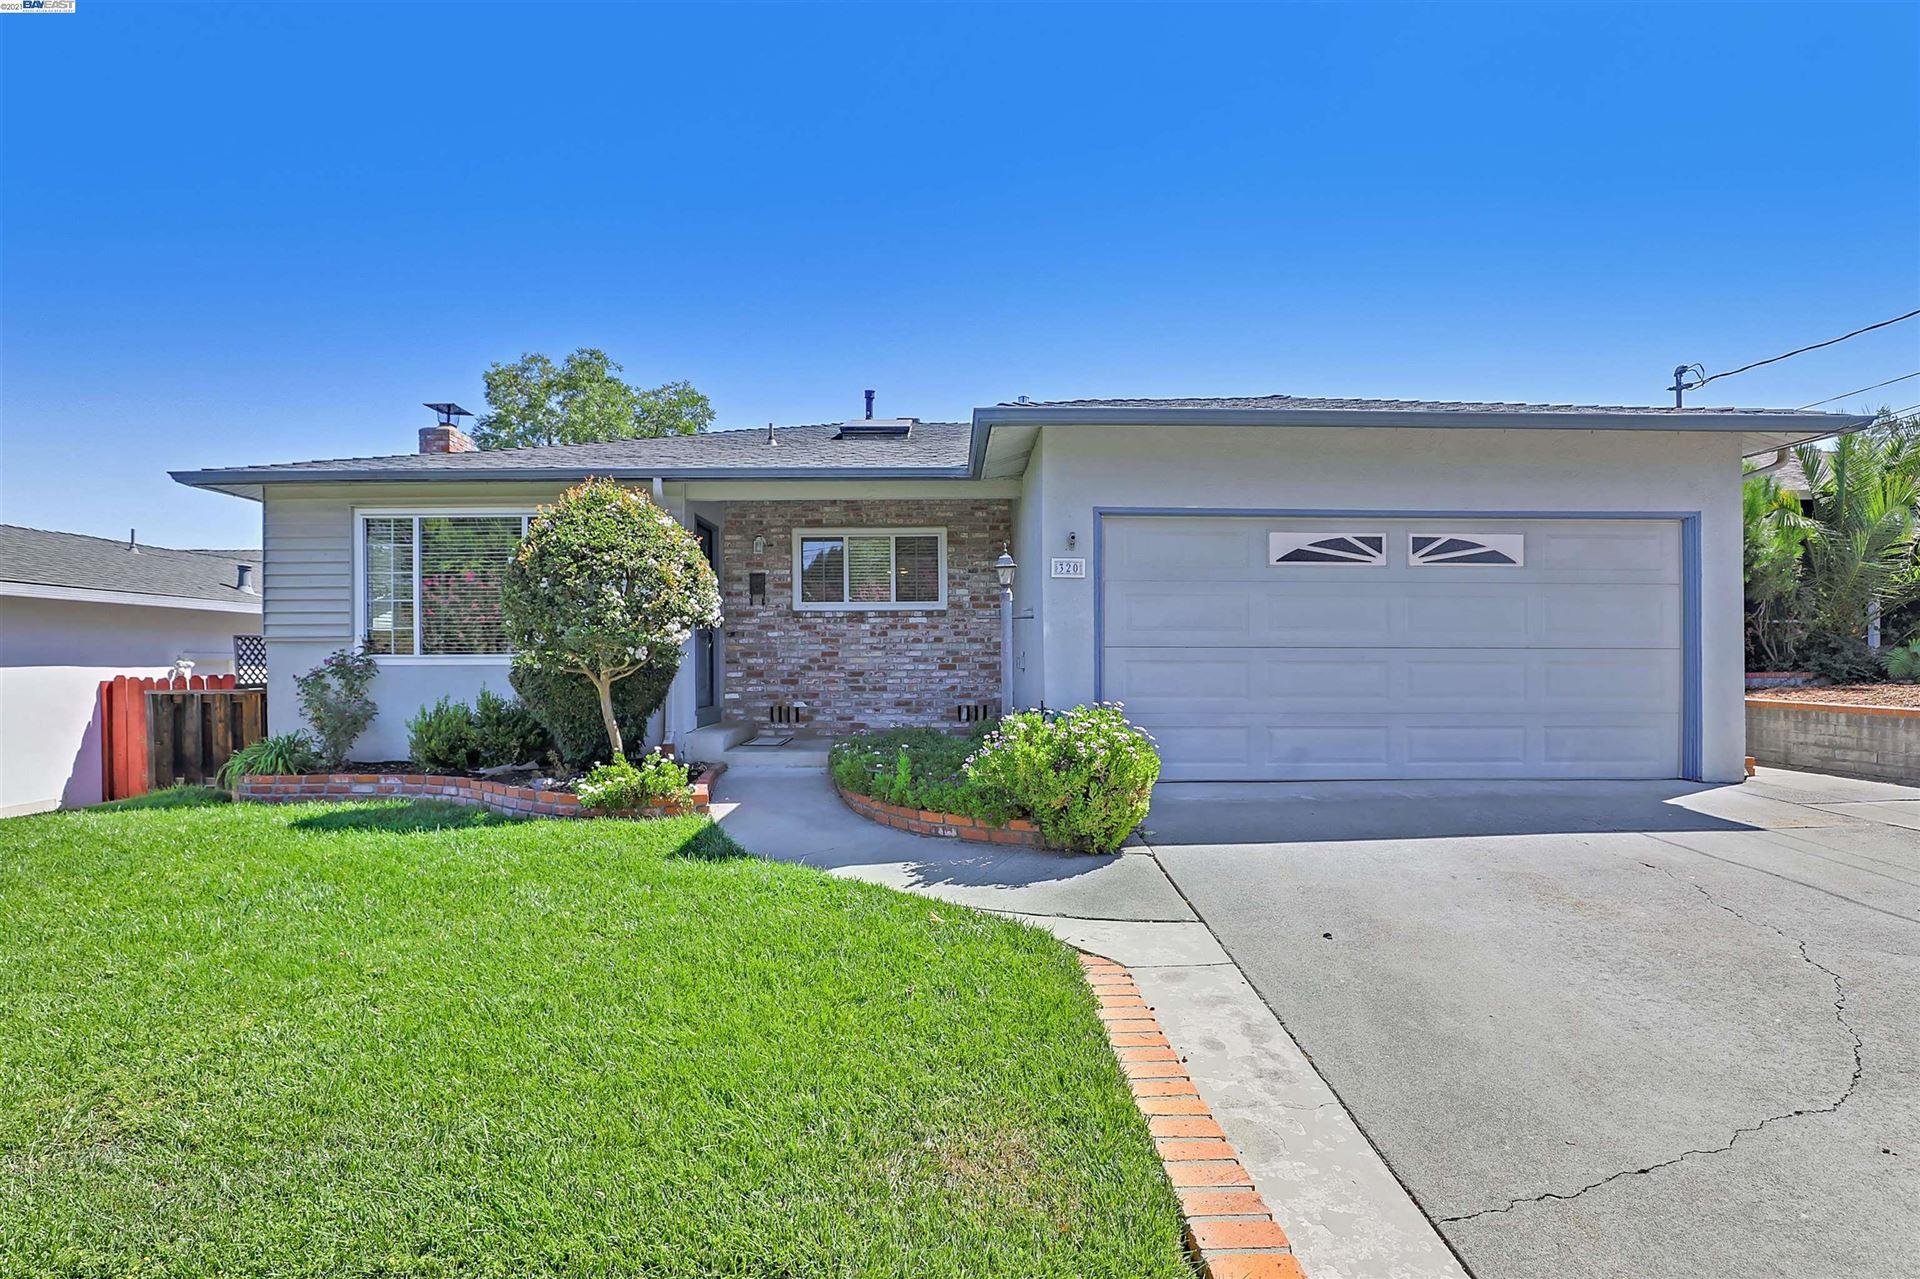 320 Christina Ct, Pleasanton, CA 94566 - #: 40968309